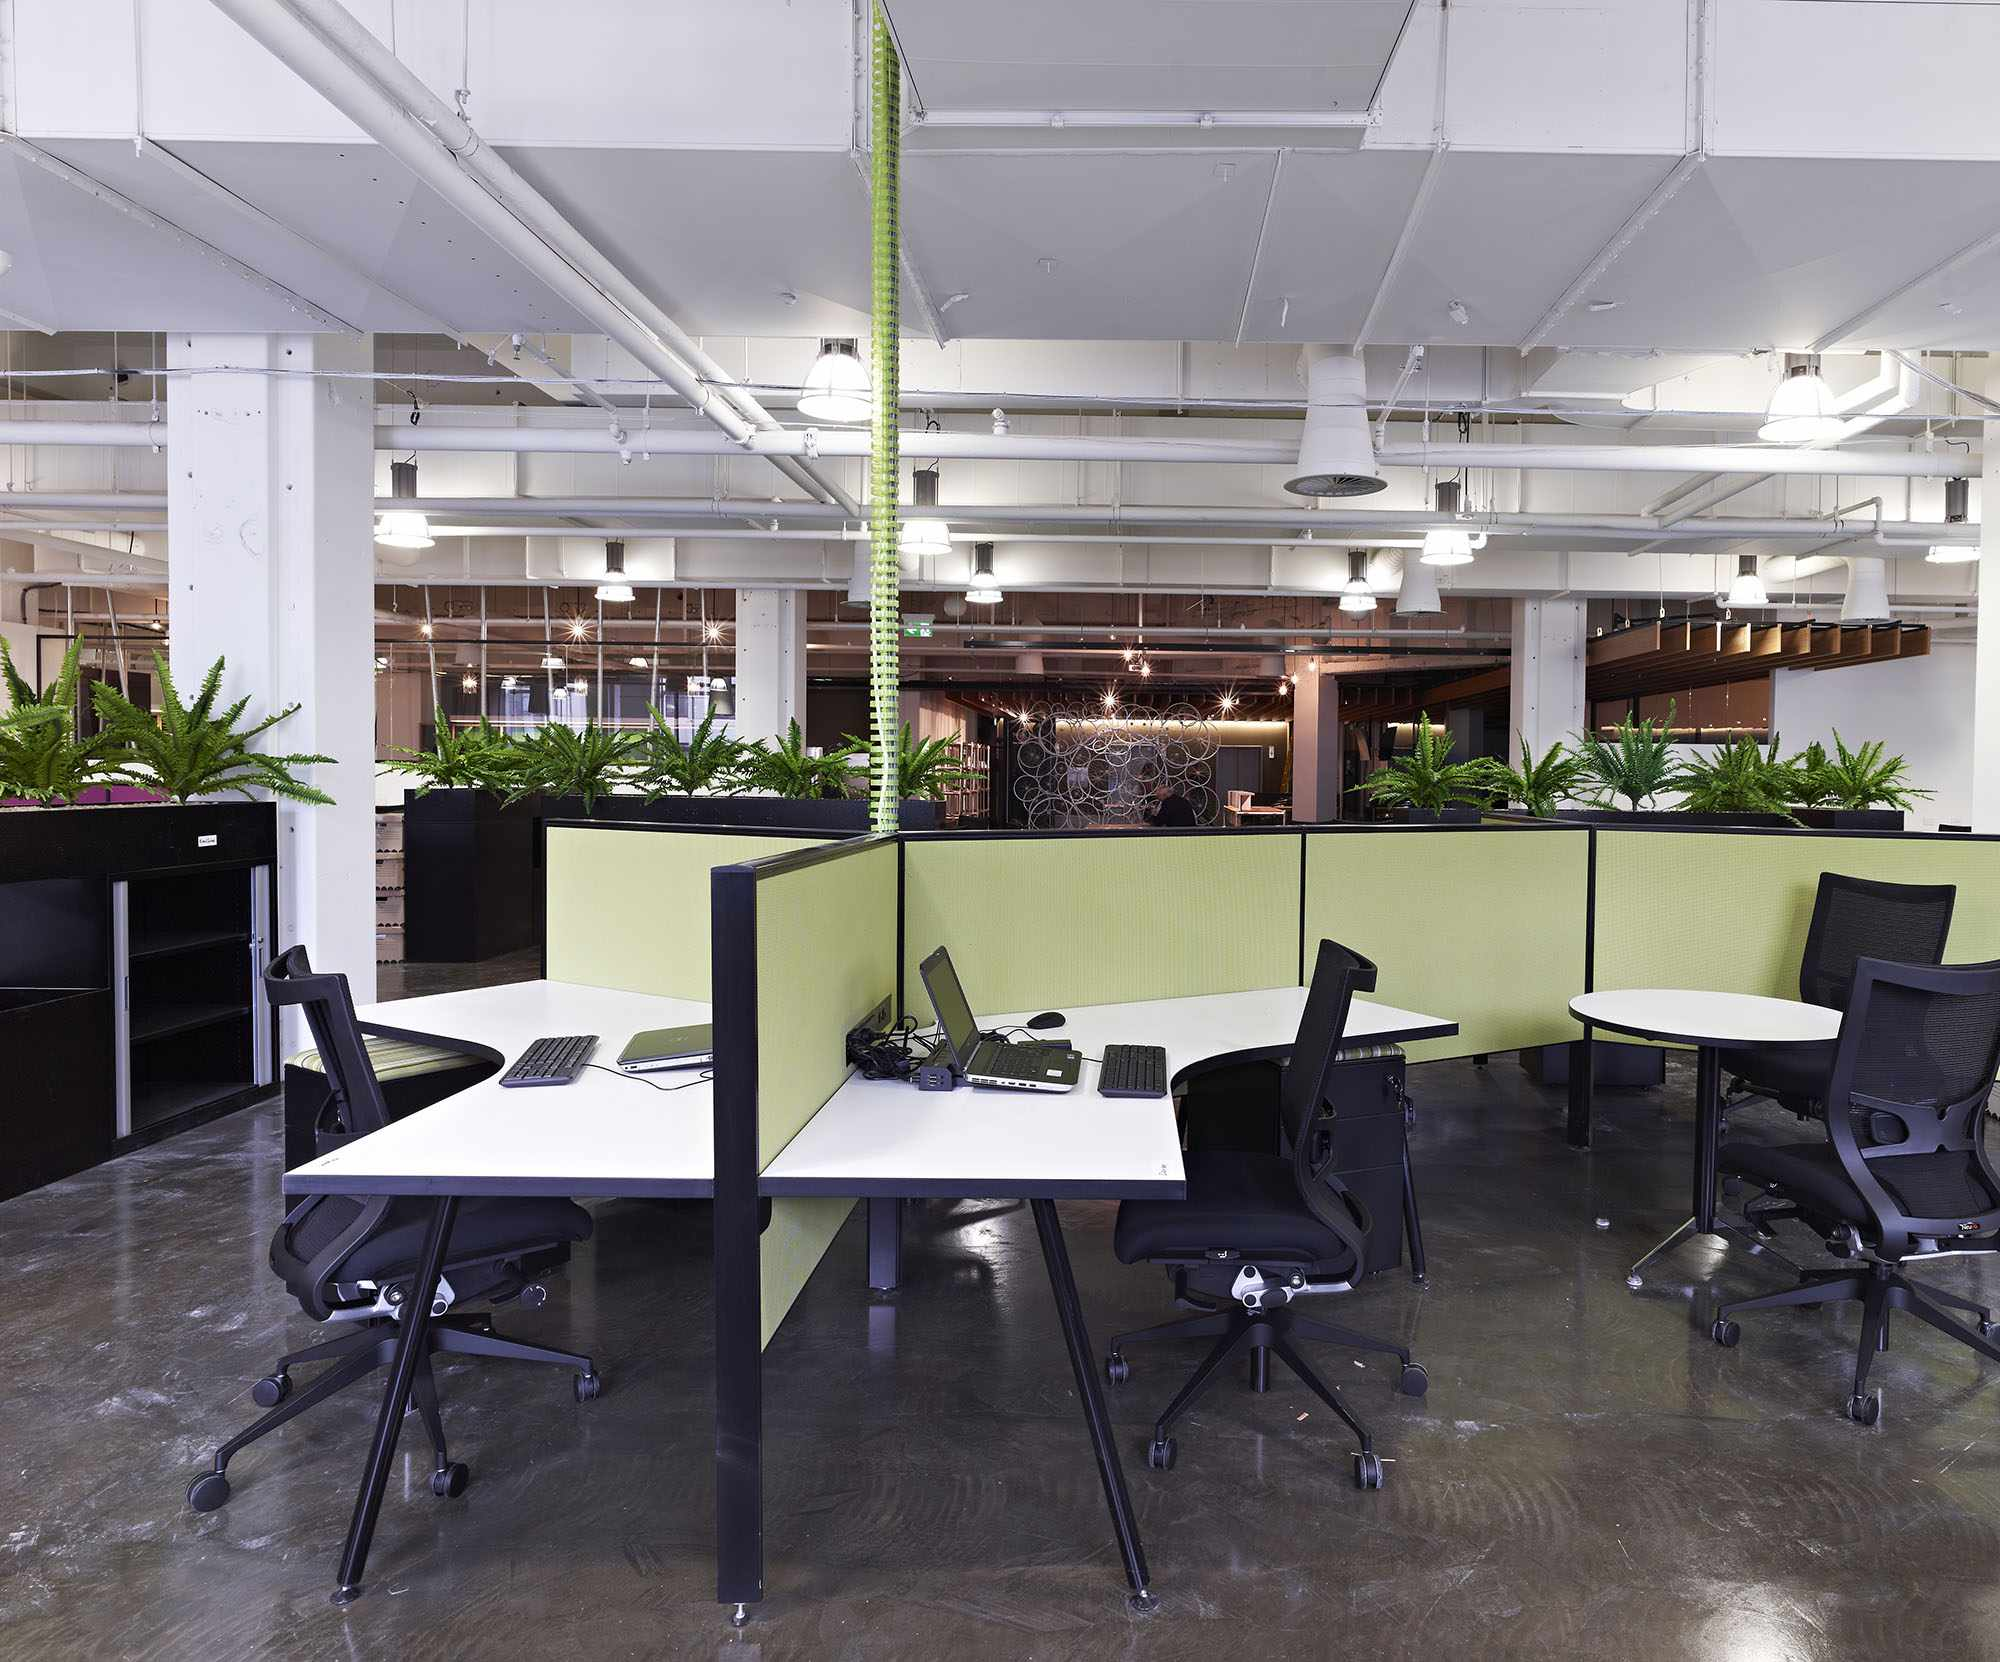 award winning office design. Award Winning Office Interior Design | Bicycle Network Marketing P